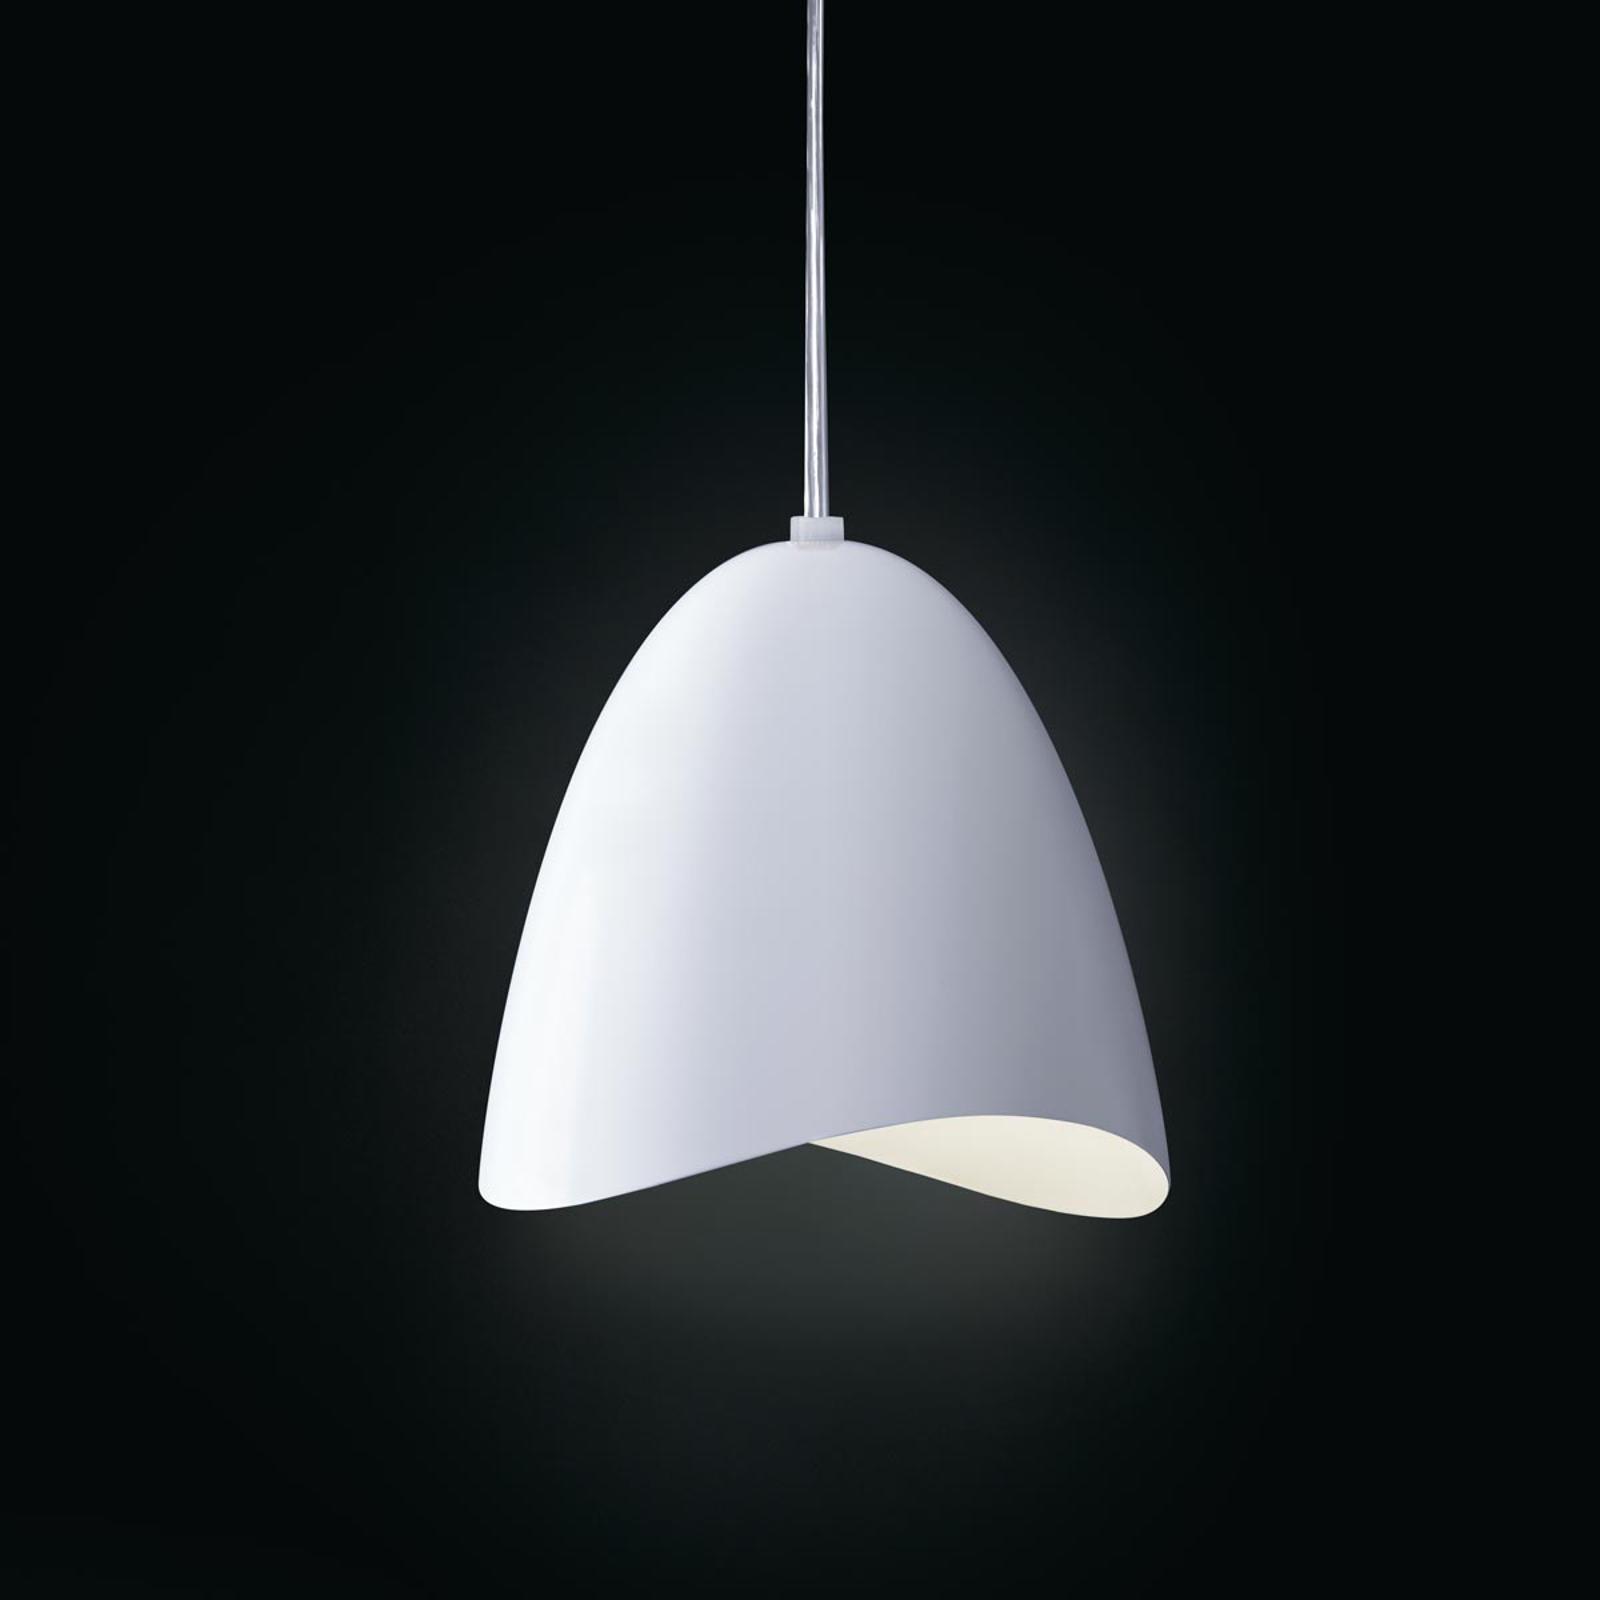 Glossy white LED pendant lamp Mirage_5501127_1